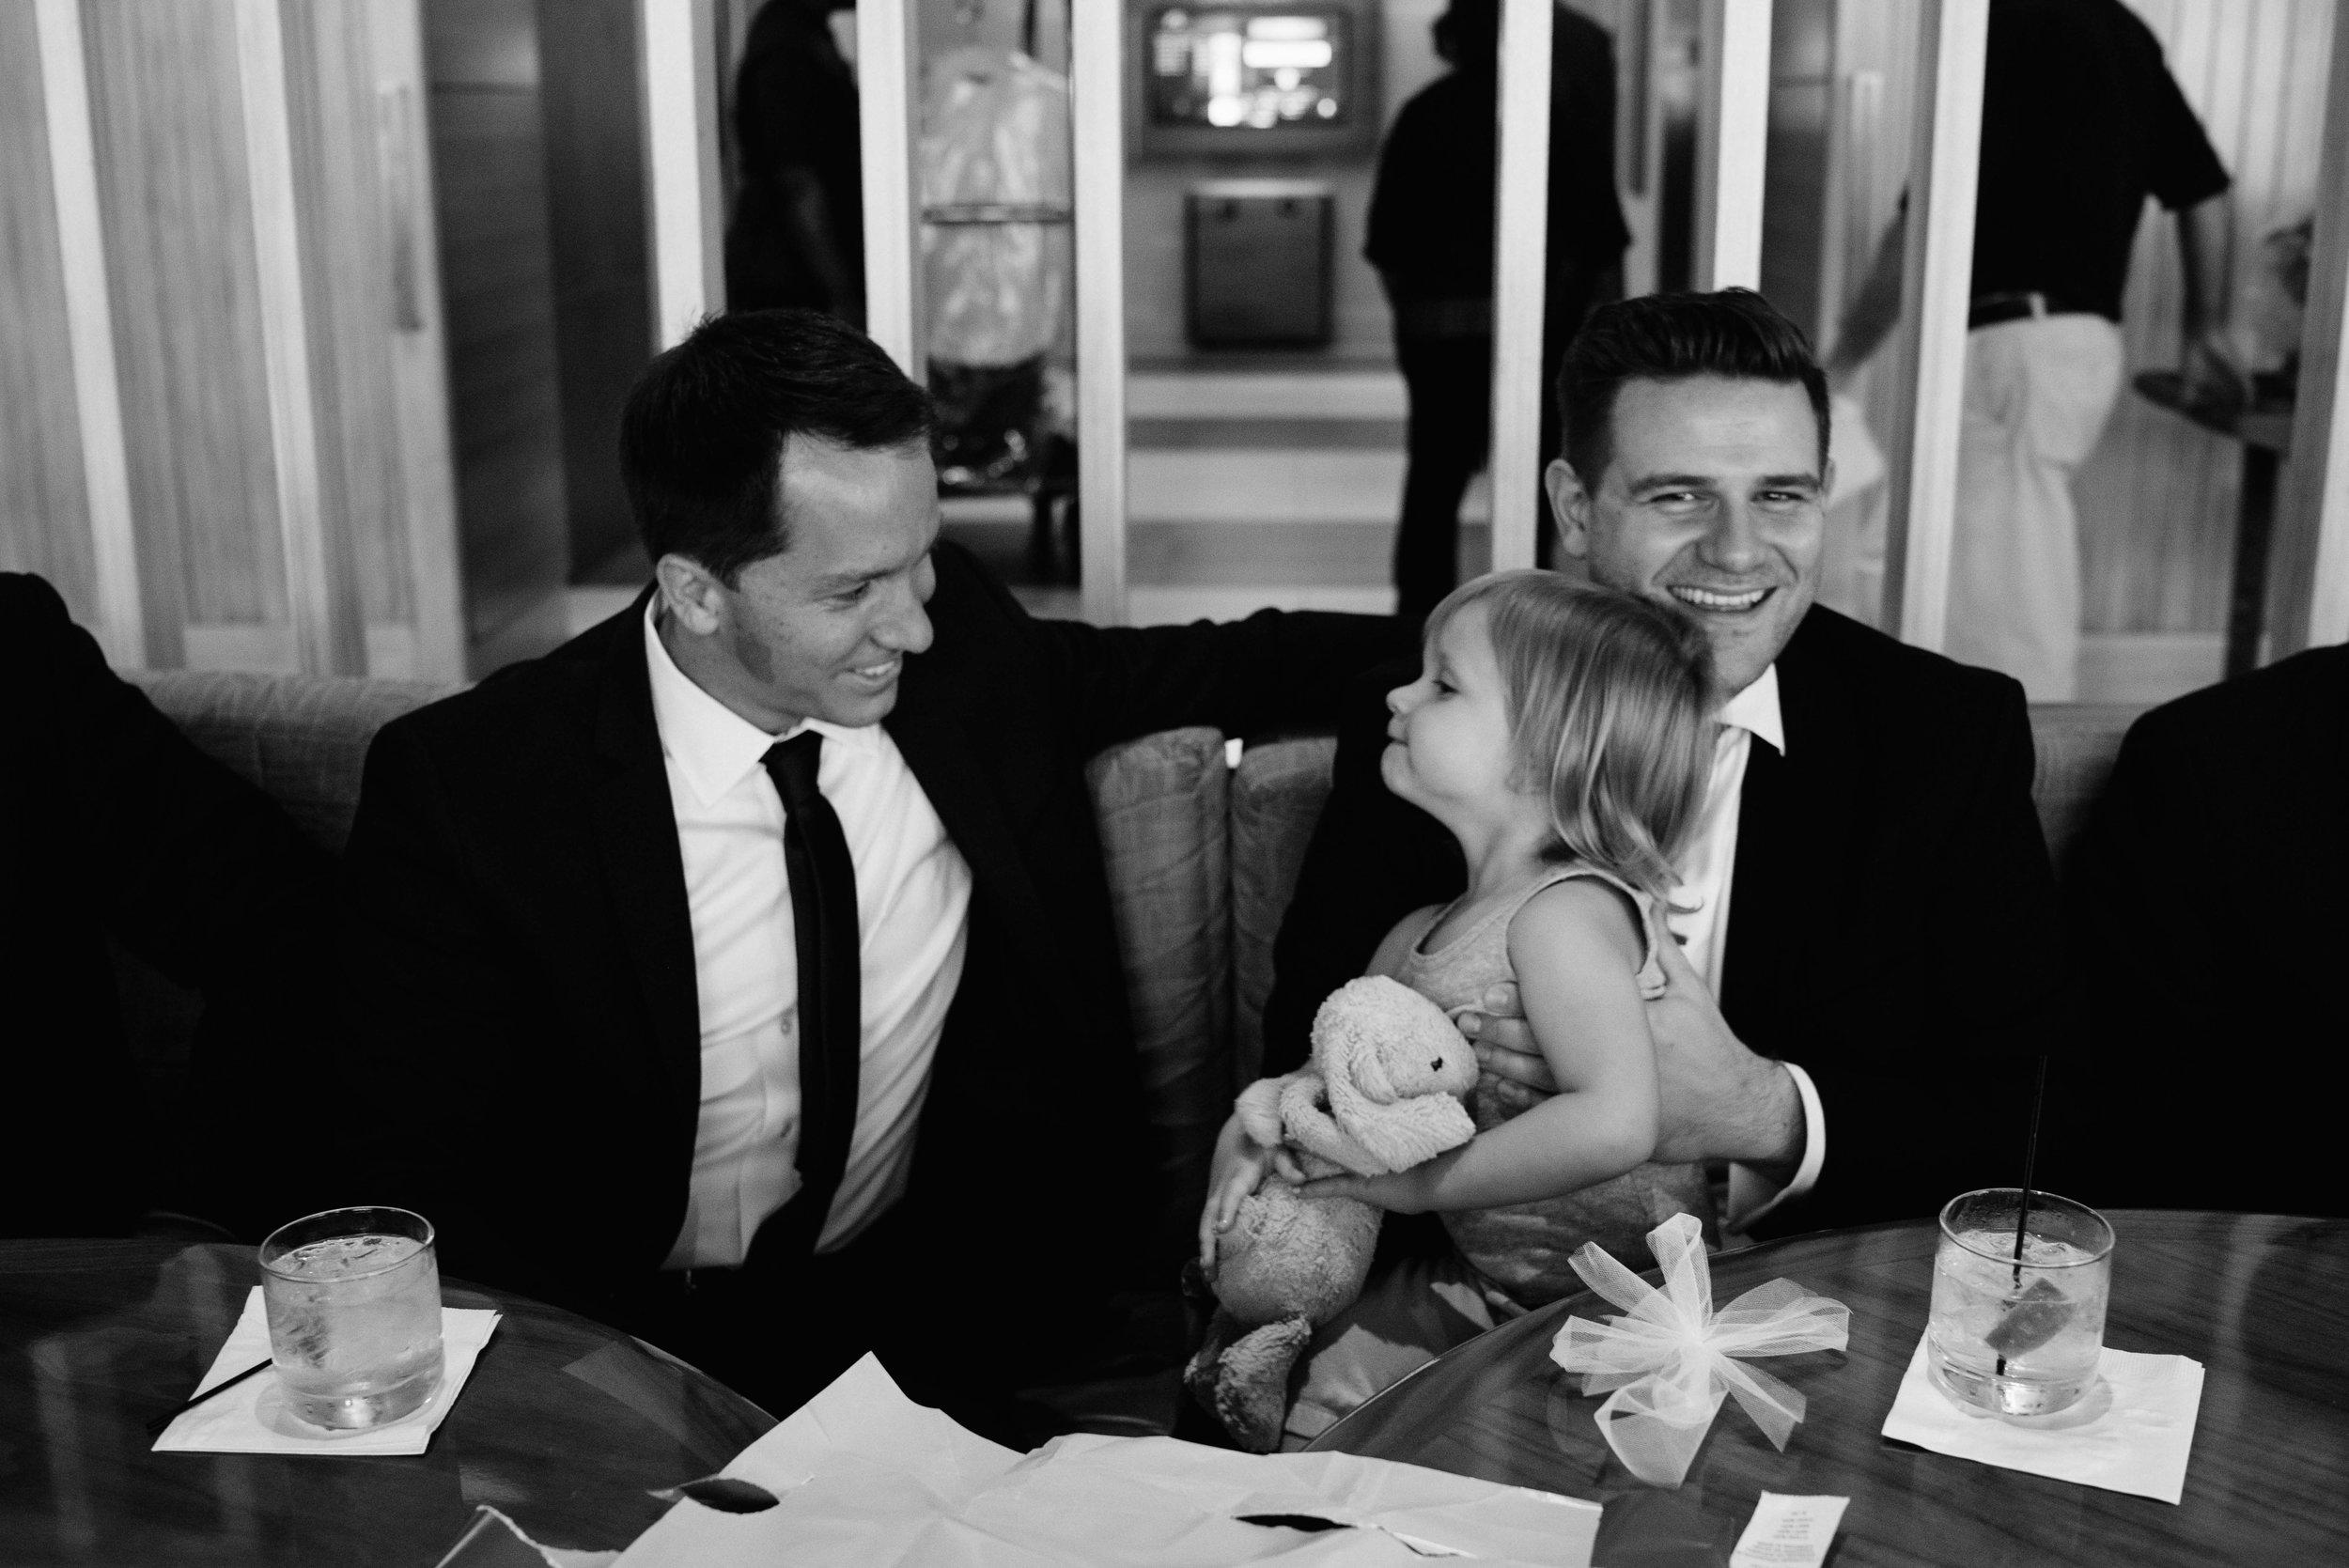 Annie-Justin-Blog-Indianapolis-Wedding-28.jpg